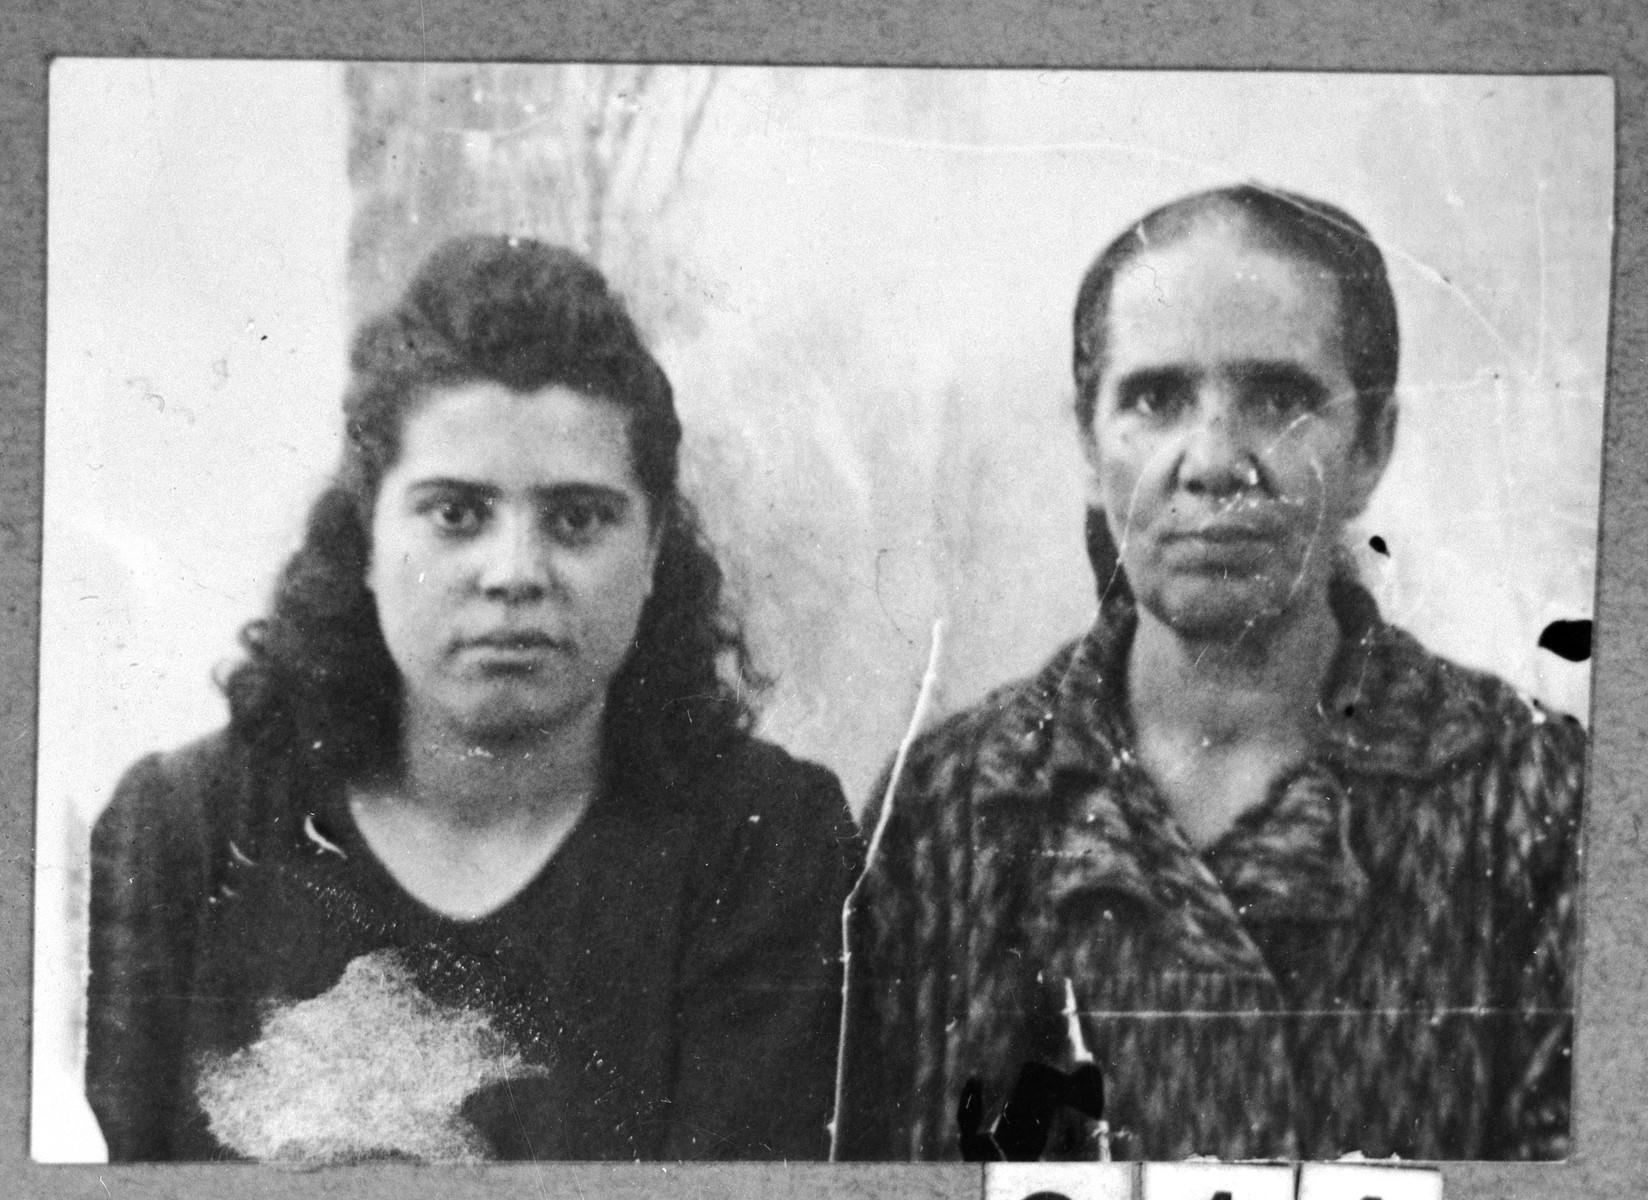 Portrait of Masaltov Russo, son of Isak Russo, and Isak's daughter, Estrea.  Estrea was a student.  They lived at Ferizovatska 30 in Bitola.